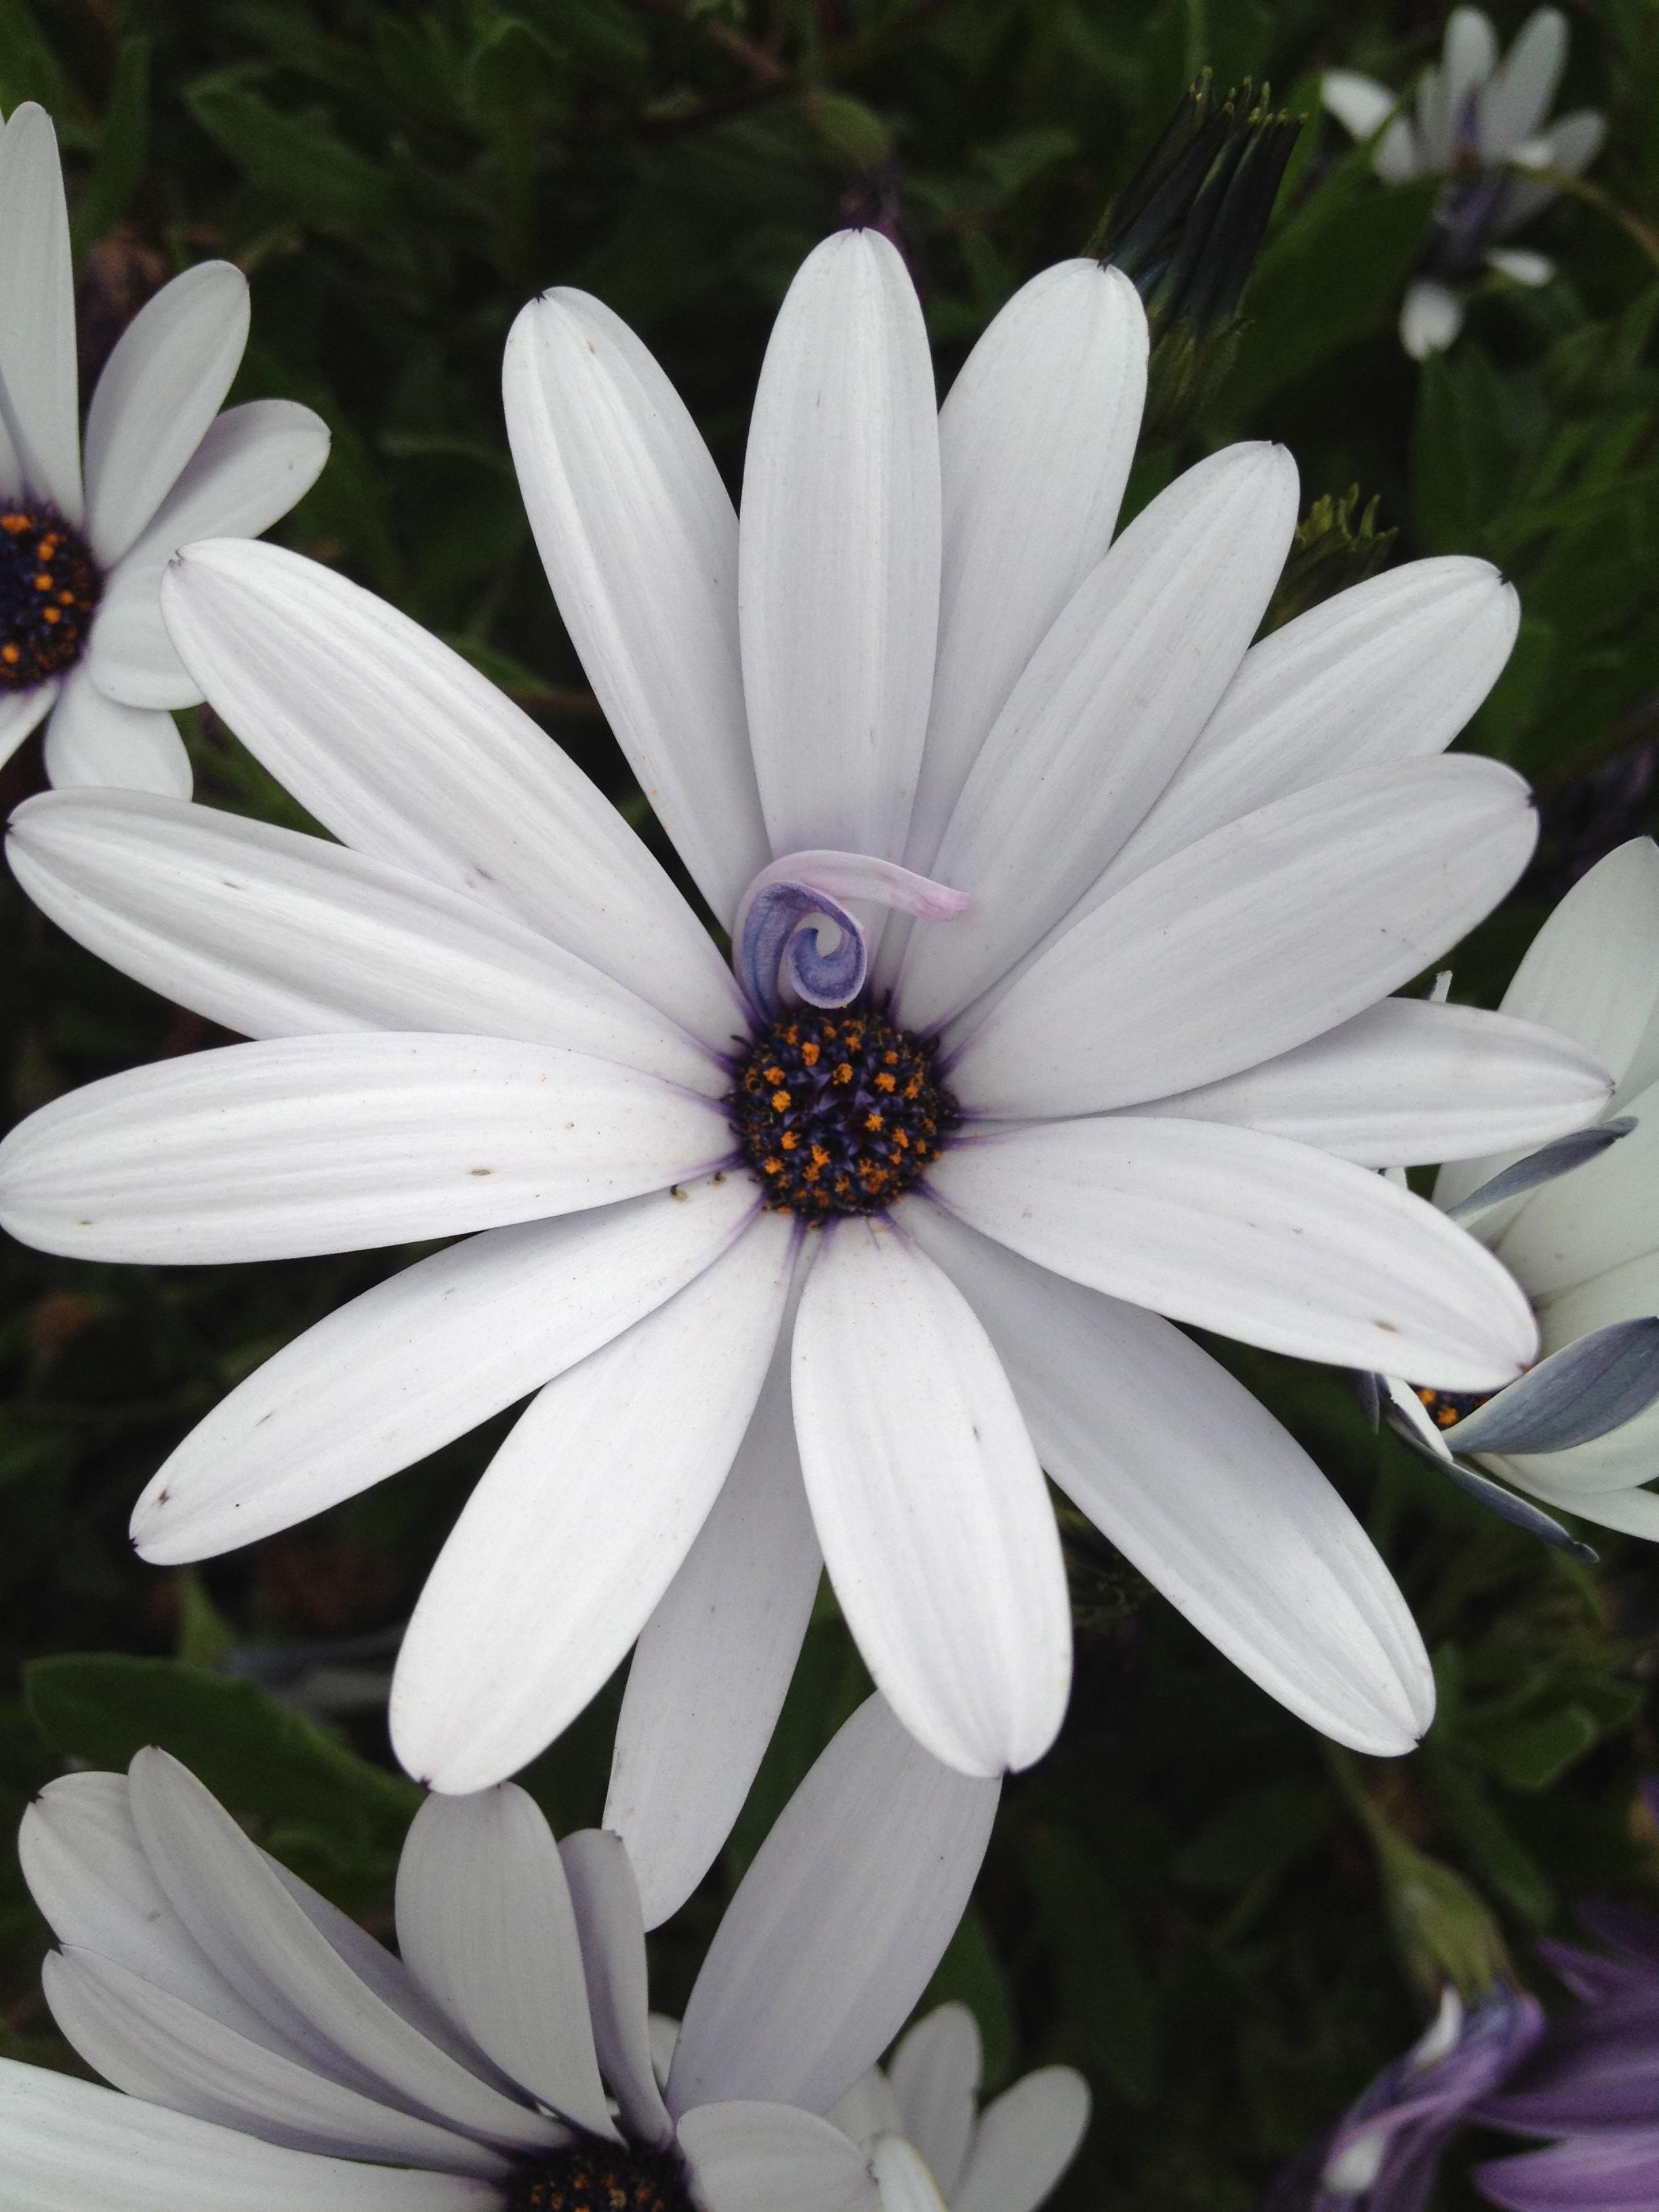 Precious flower at the Fort Mason Community Garden, overlooking San Fran